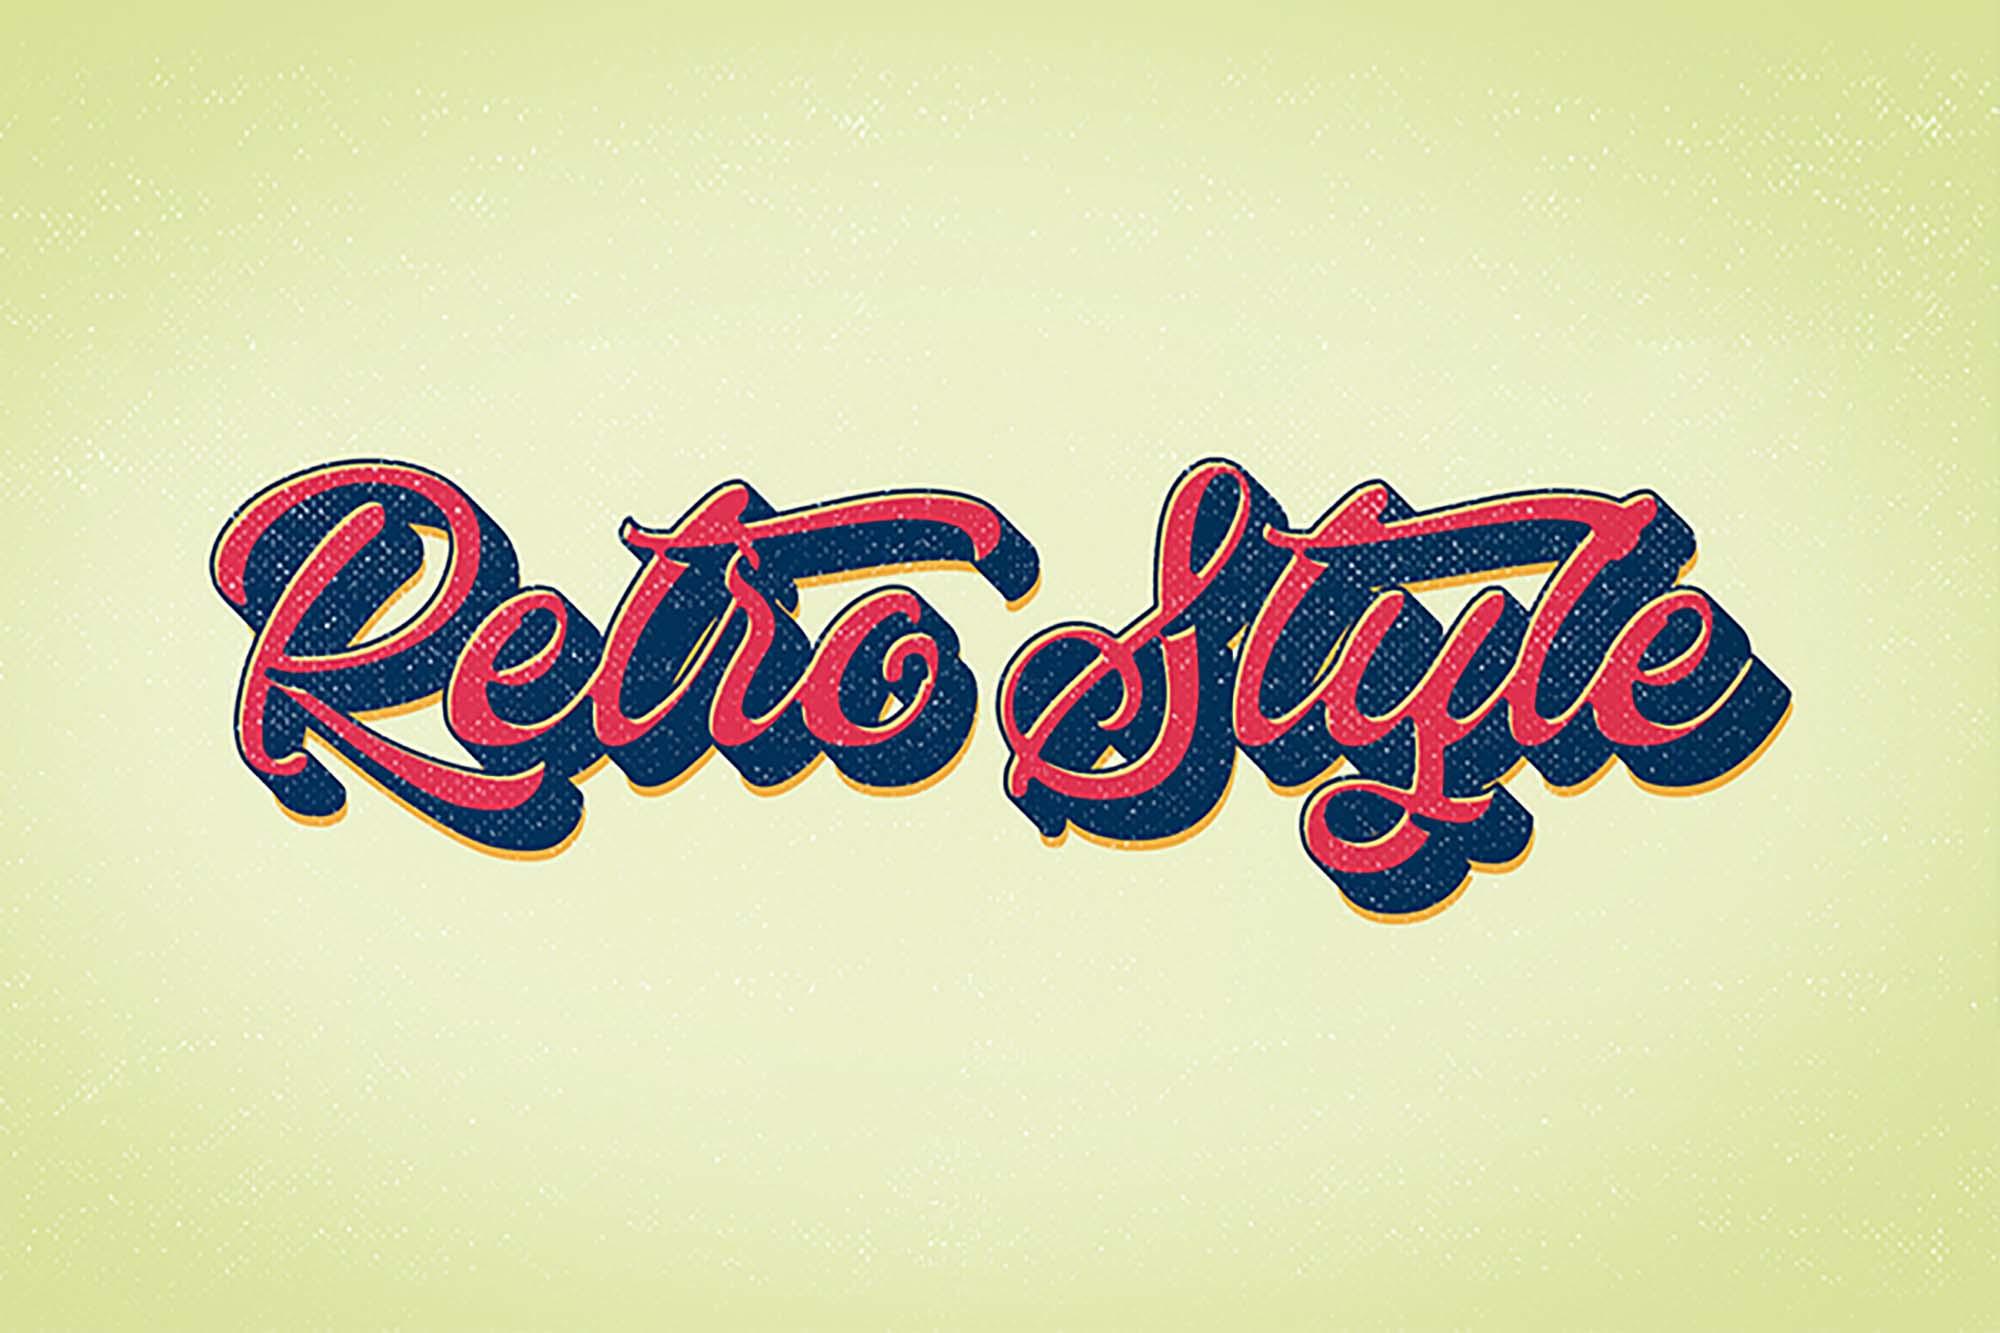 Retro Vintage Text Effect 2